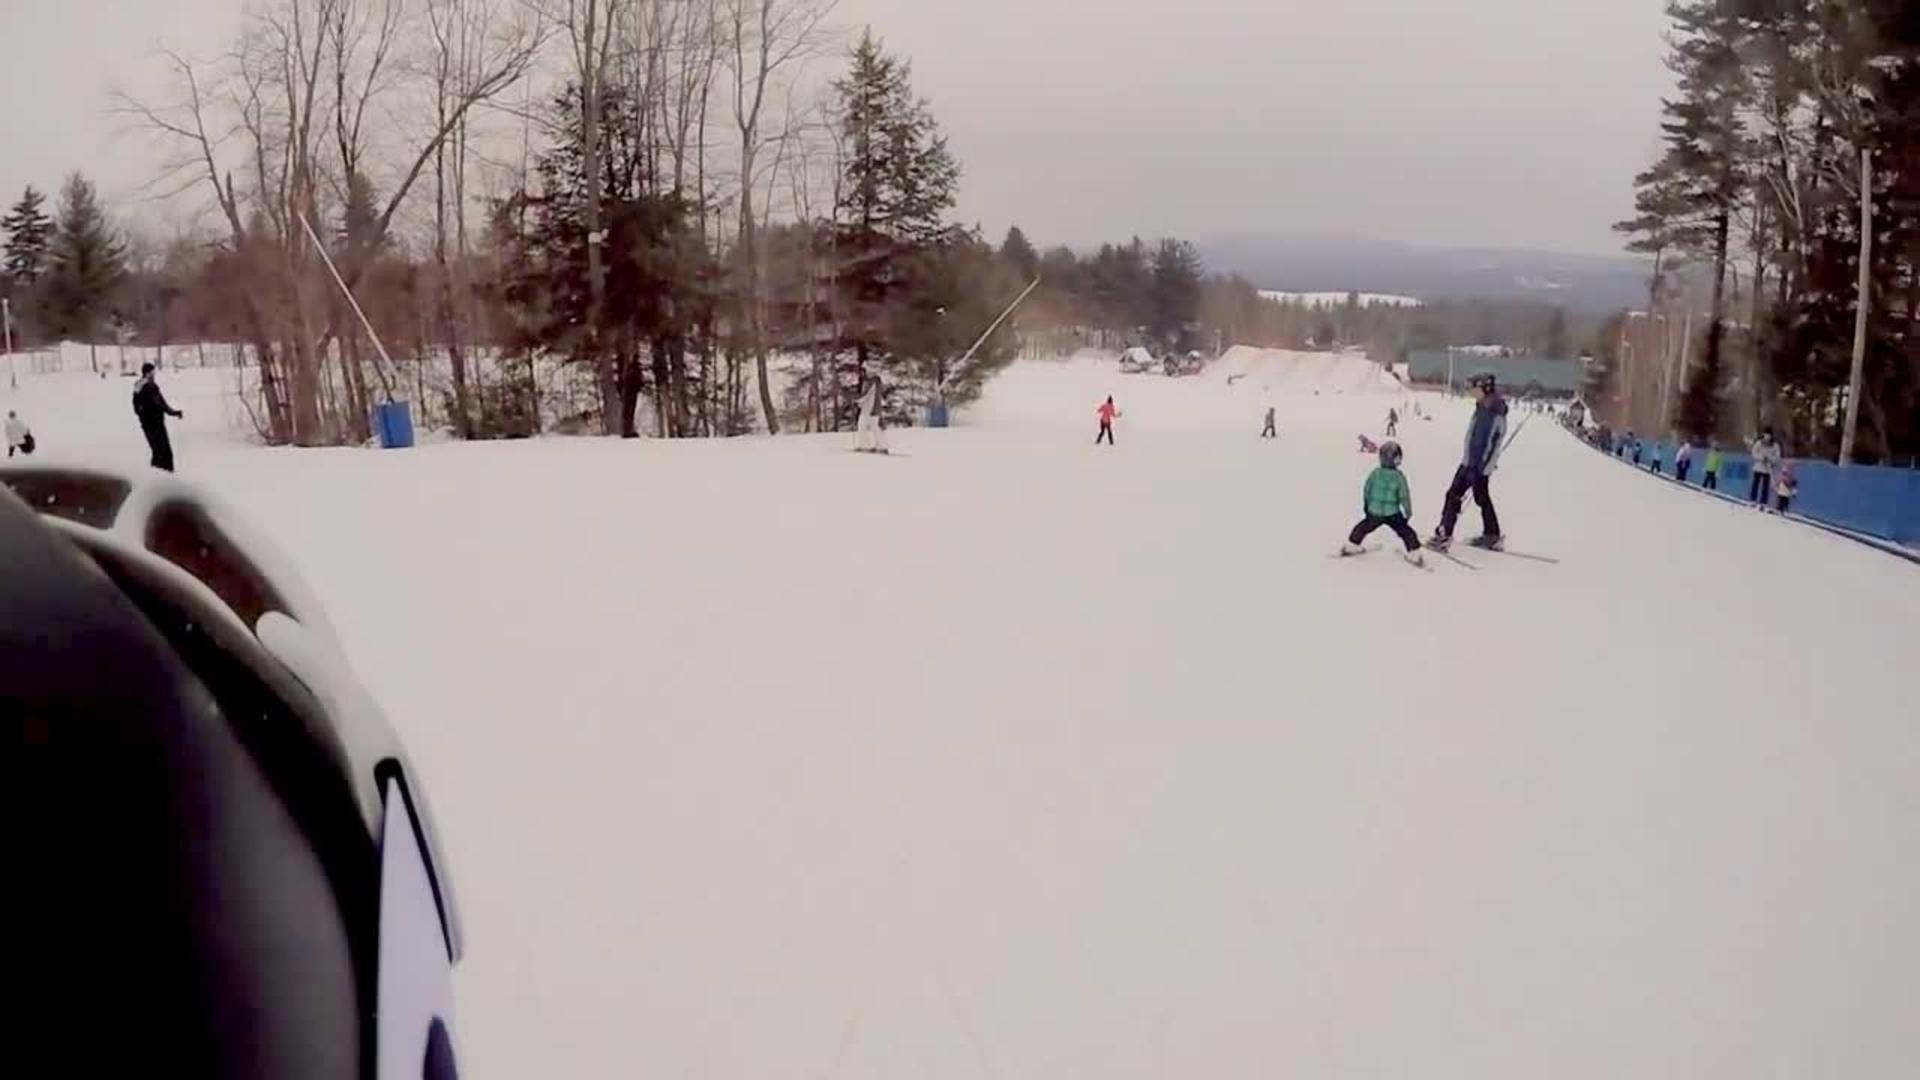 snowboarding backflip scorpion fail jukin media